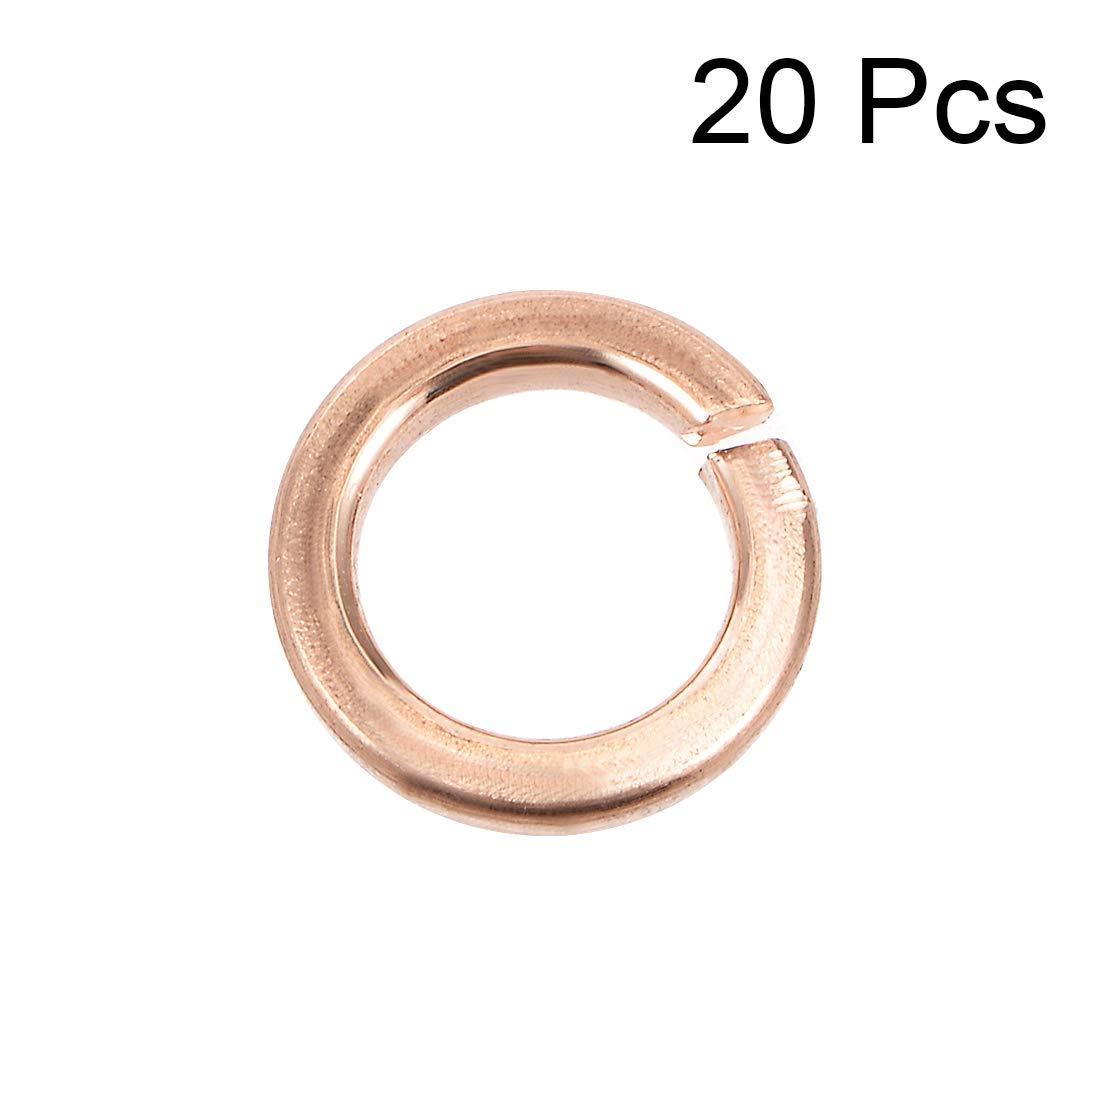 20Pcs Flat Copper Washer 5.3 mm x 8 mm x 1.3 mm for Screw Bolt